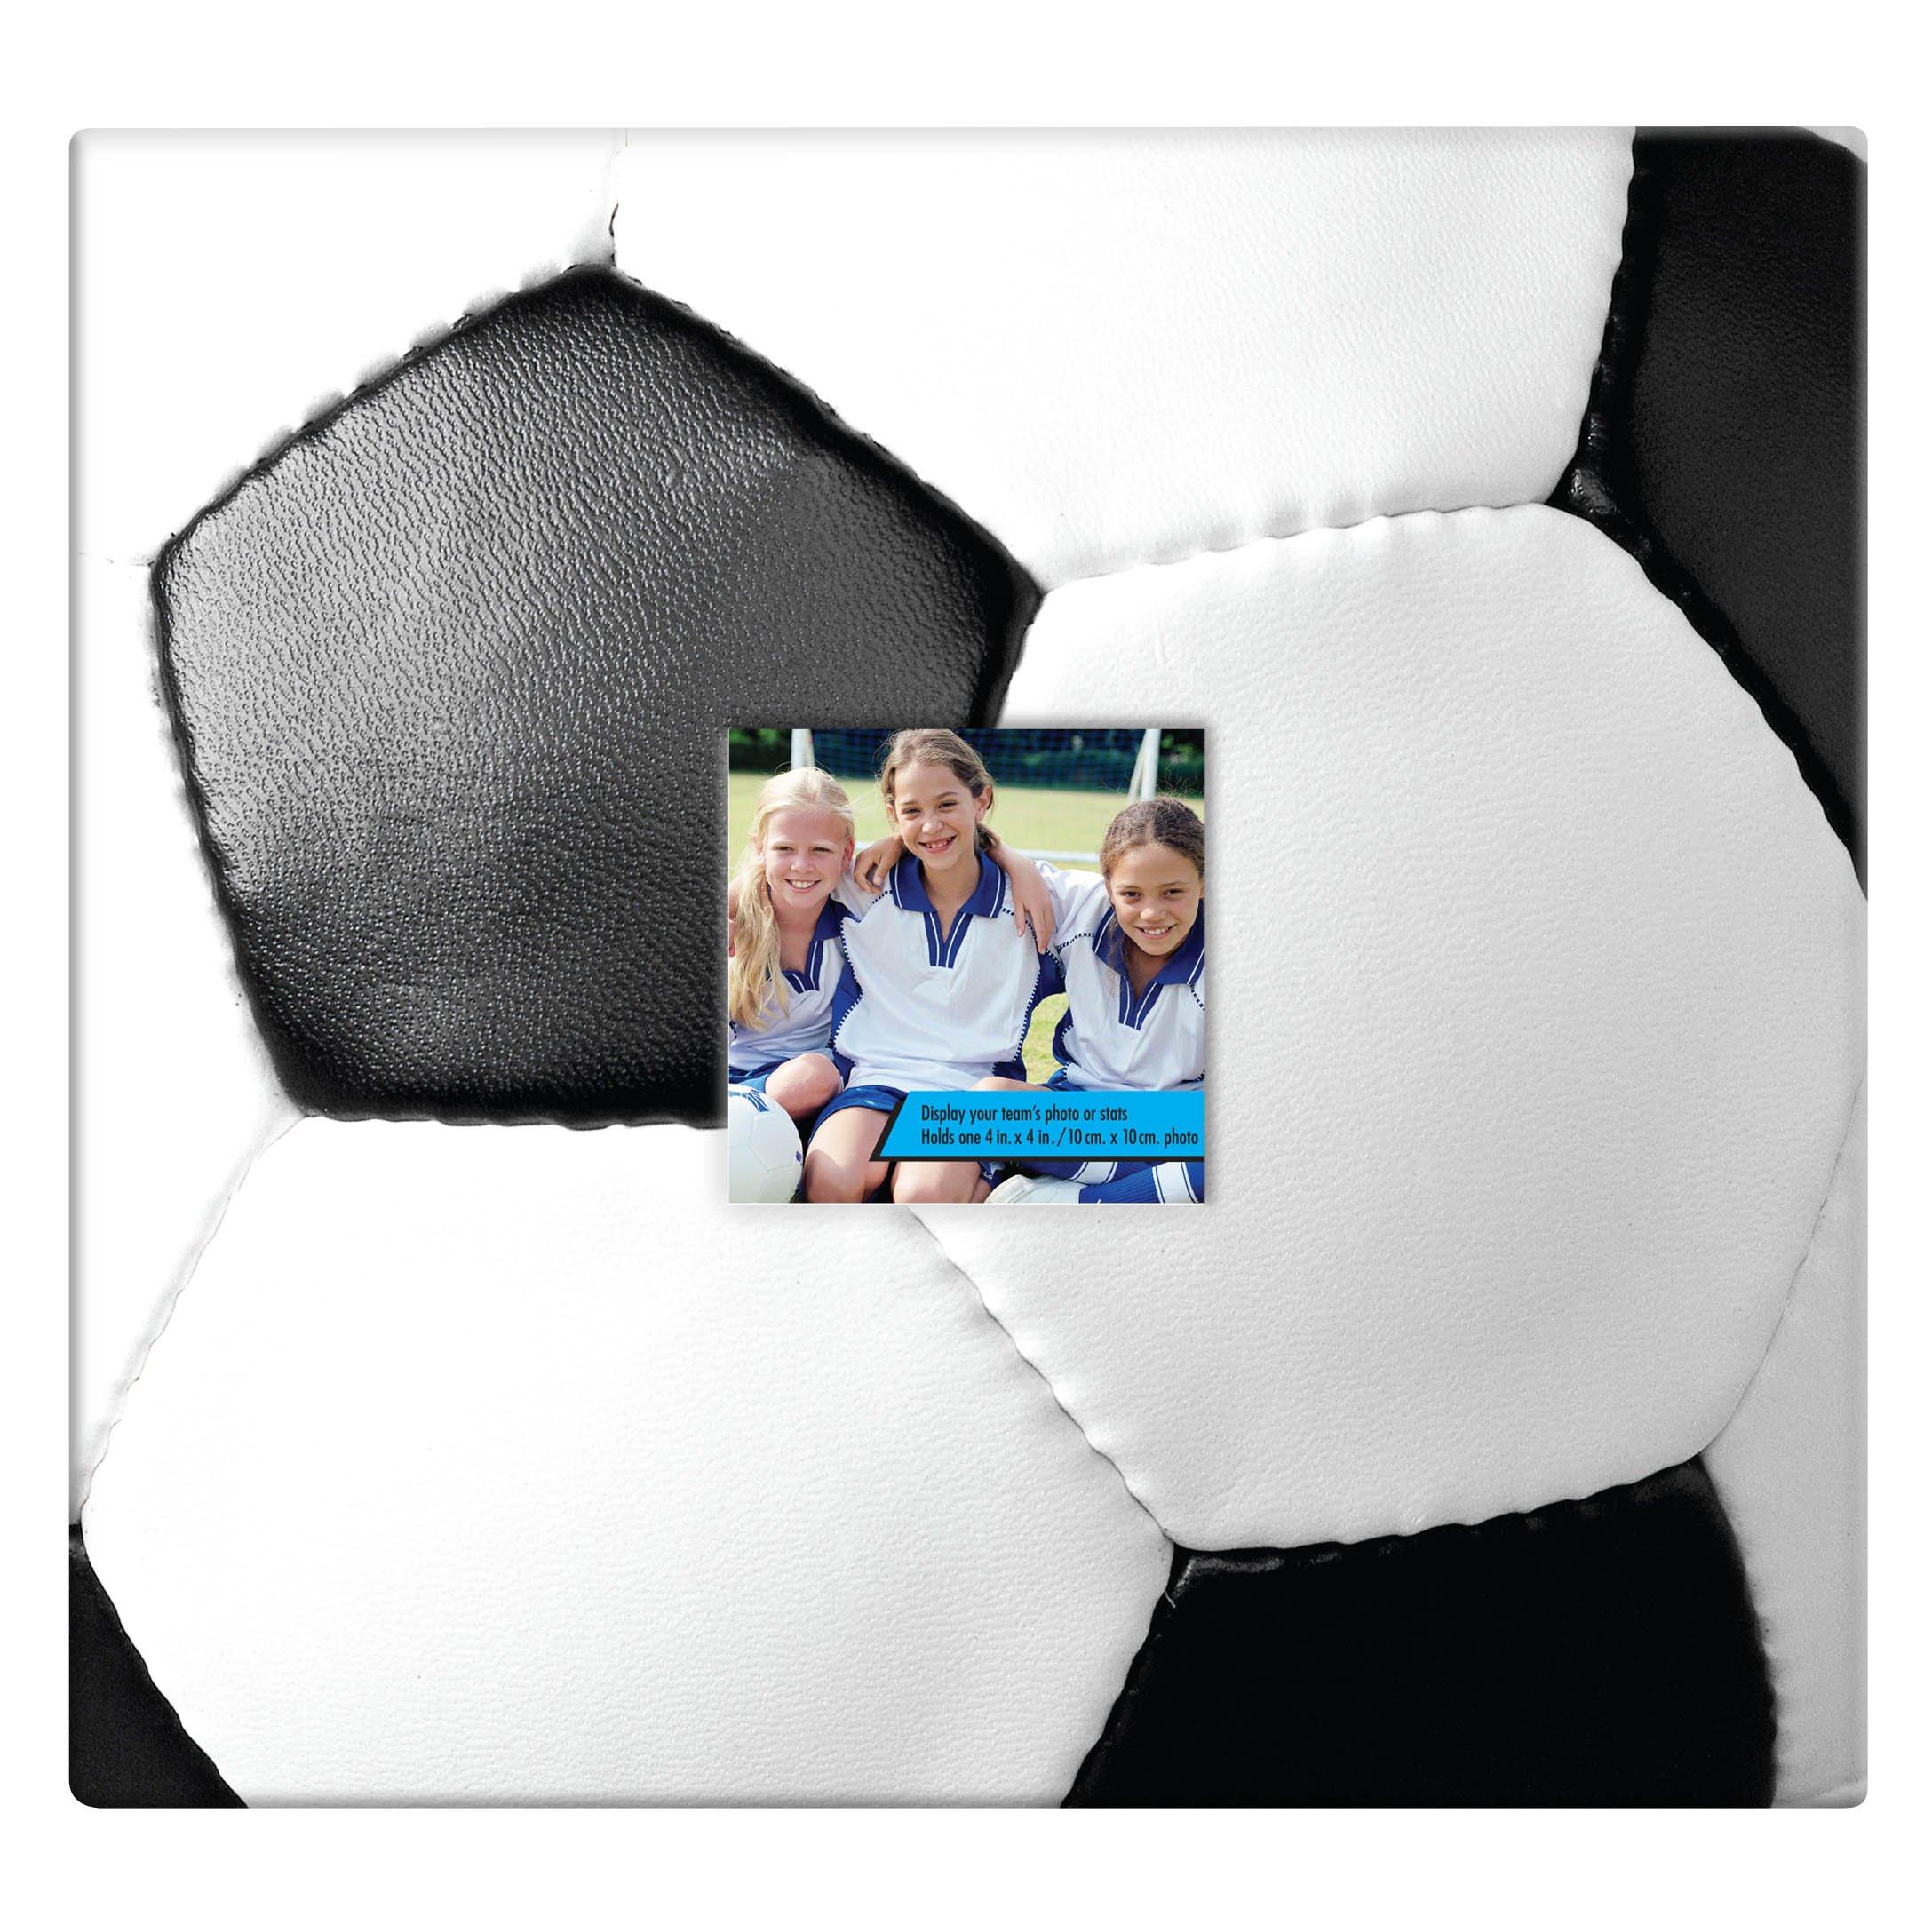 MCS 12x12 Inch Sport and Hobby Postbound Album, Soccer (865403)